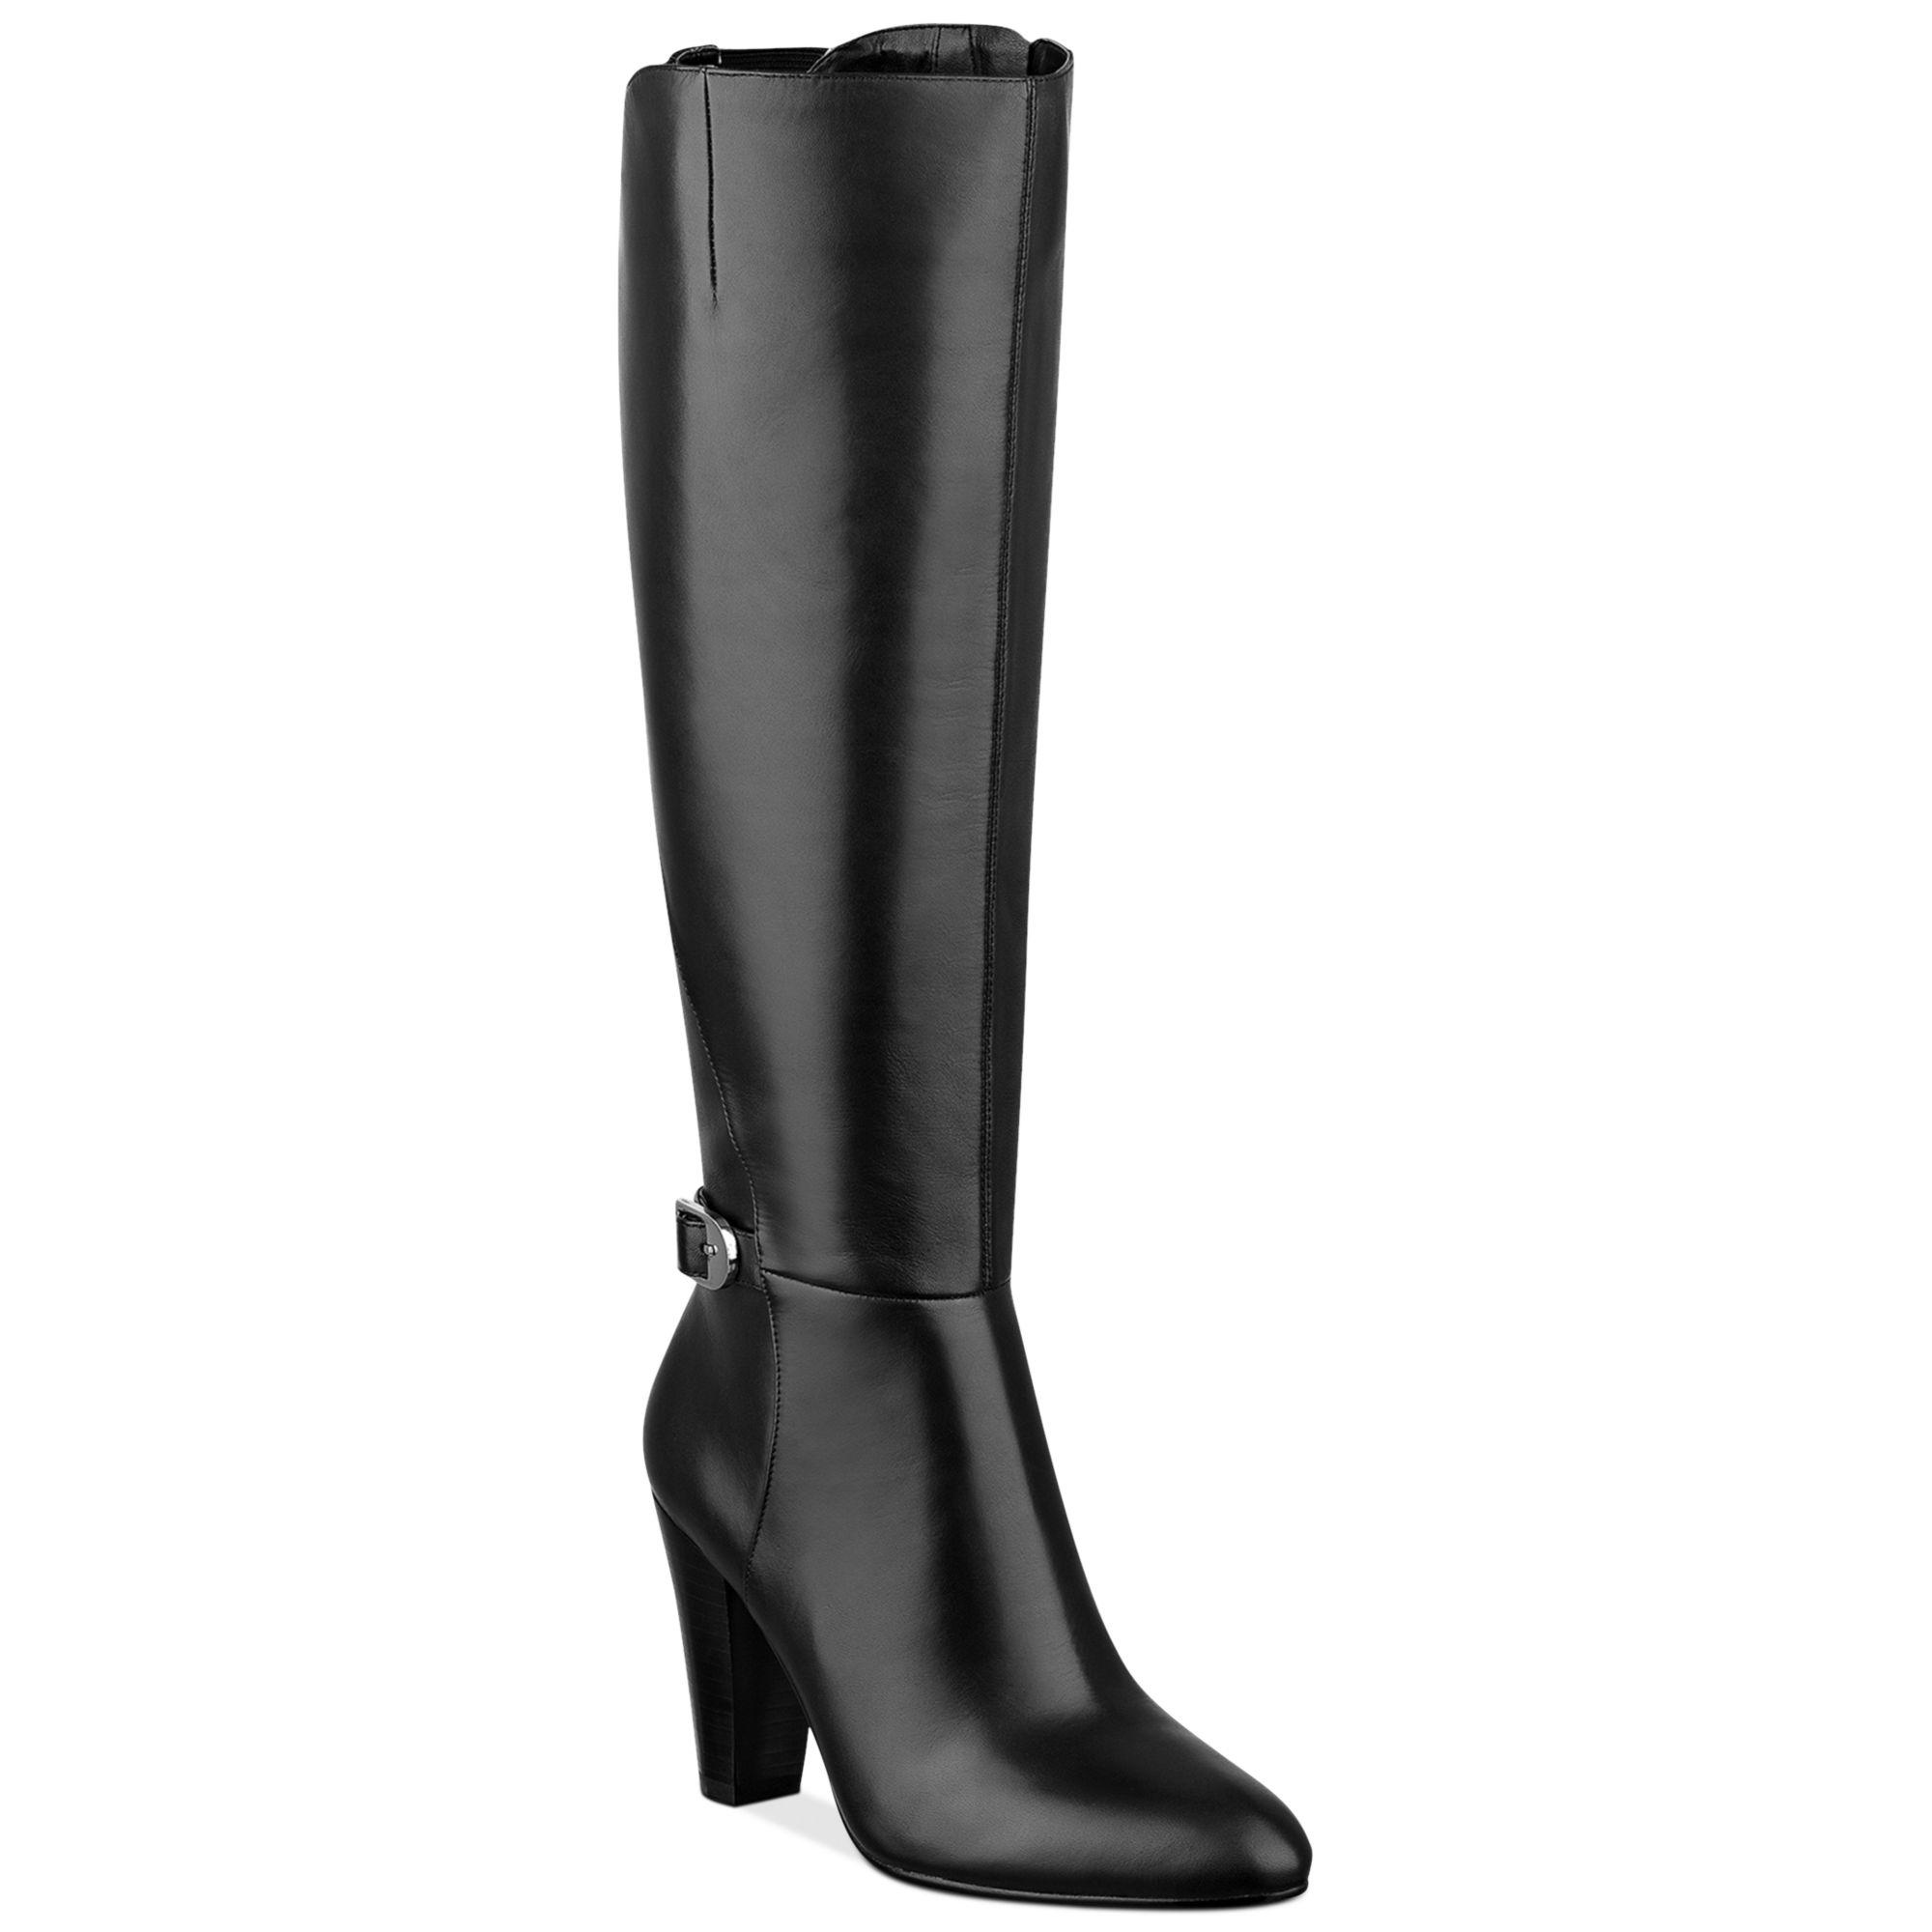 Marc Fisher Shayna Tall Dress Boots In Black | Lyst